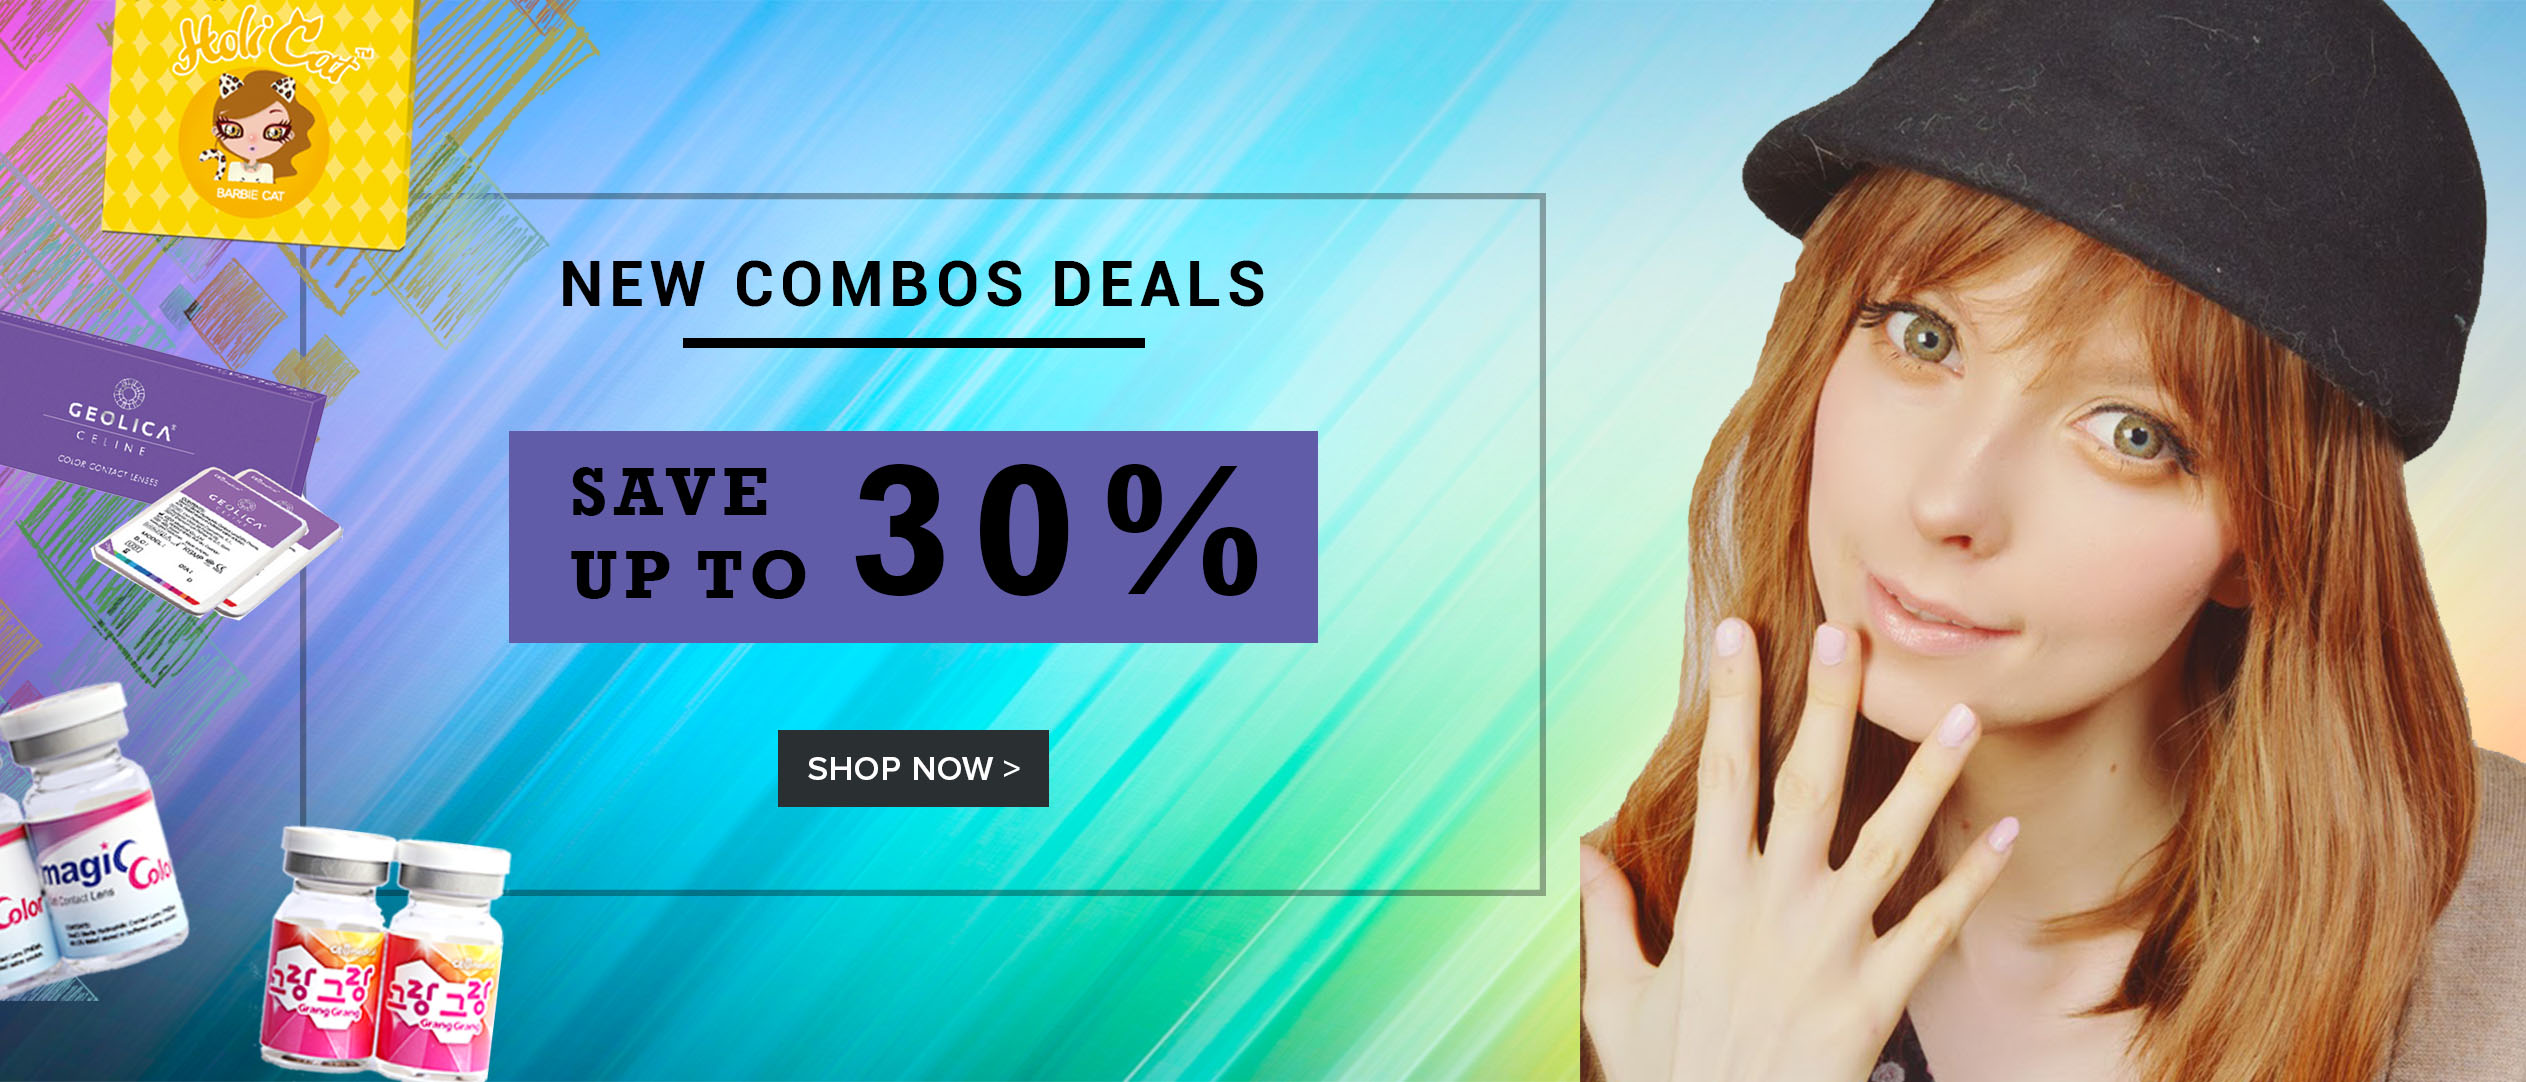 2db81f76d1a Buy Best Circle Coloured Contact Lenses- Best Prescription Colored ...